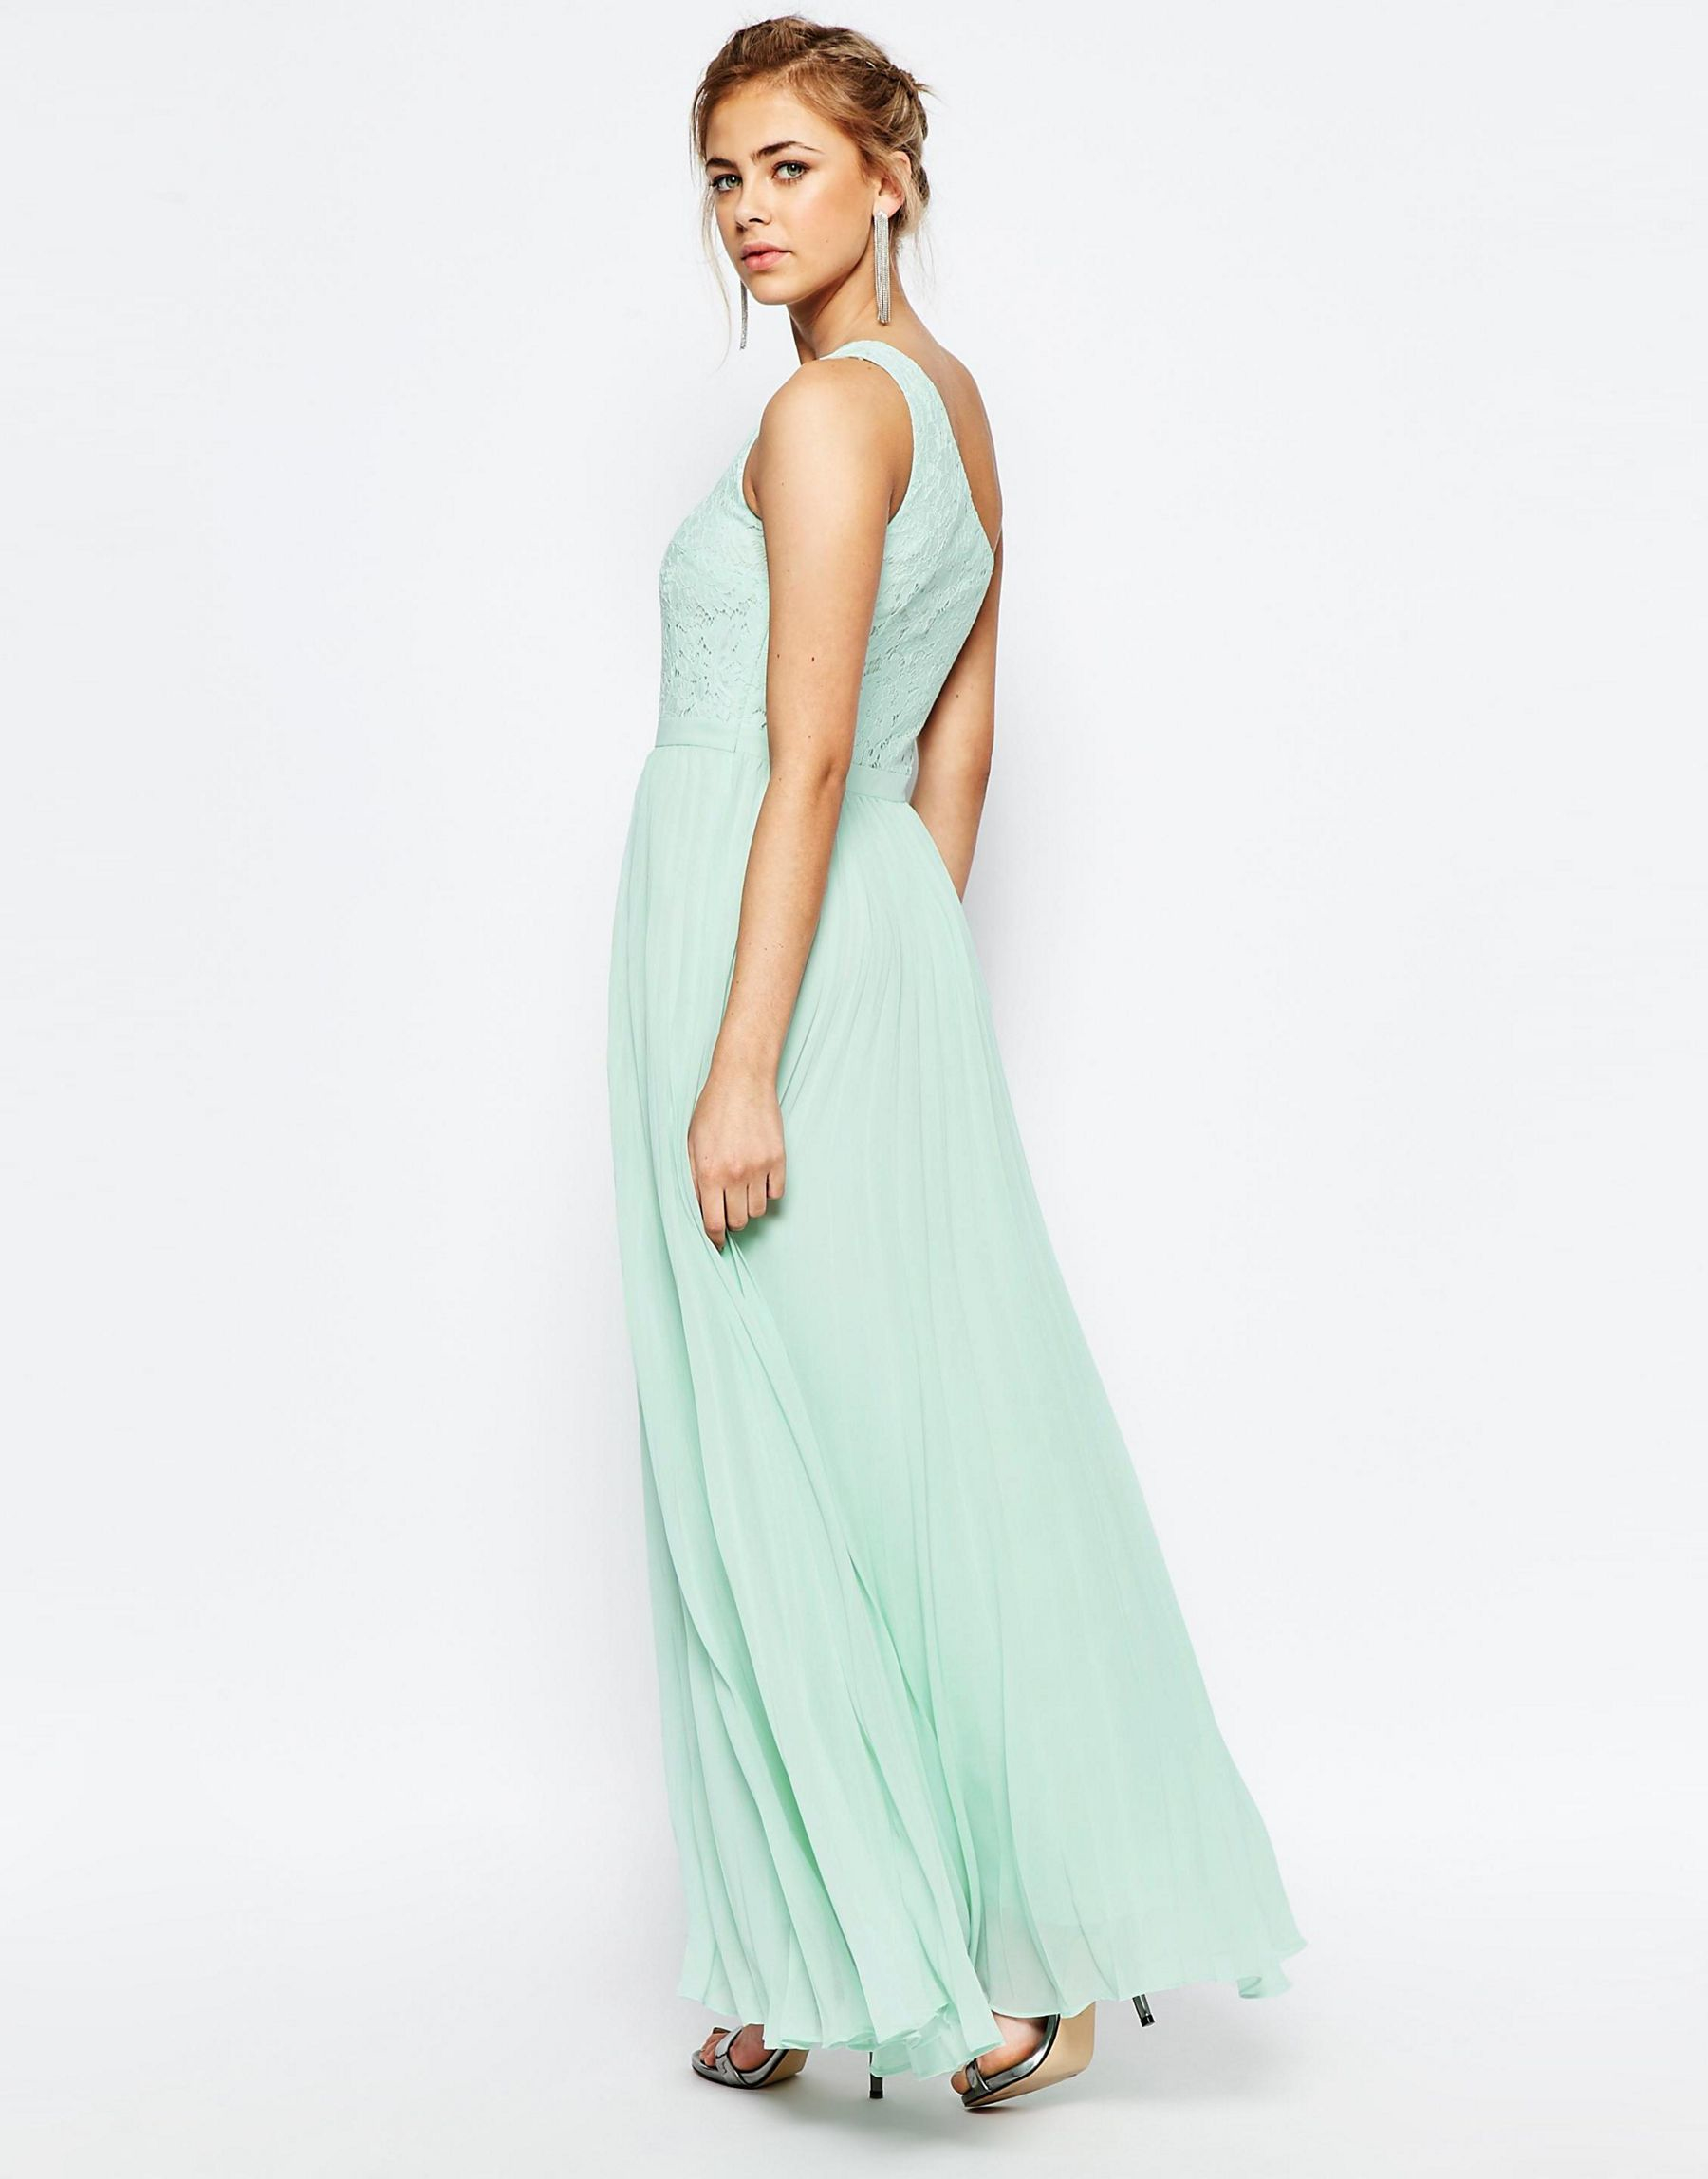 Debs Long Dresses Mint